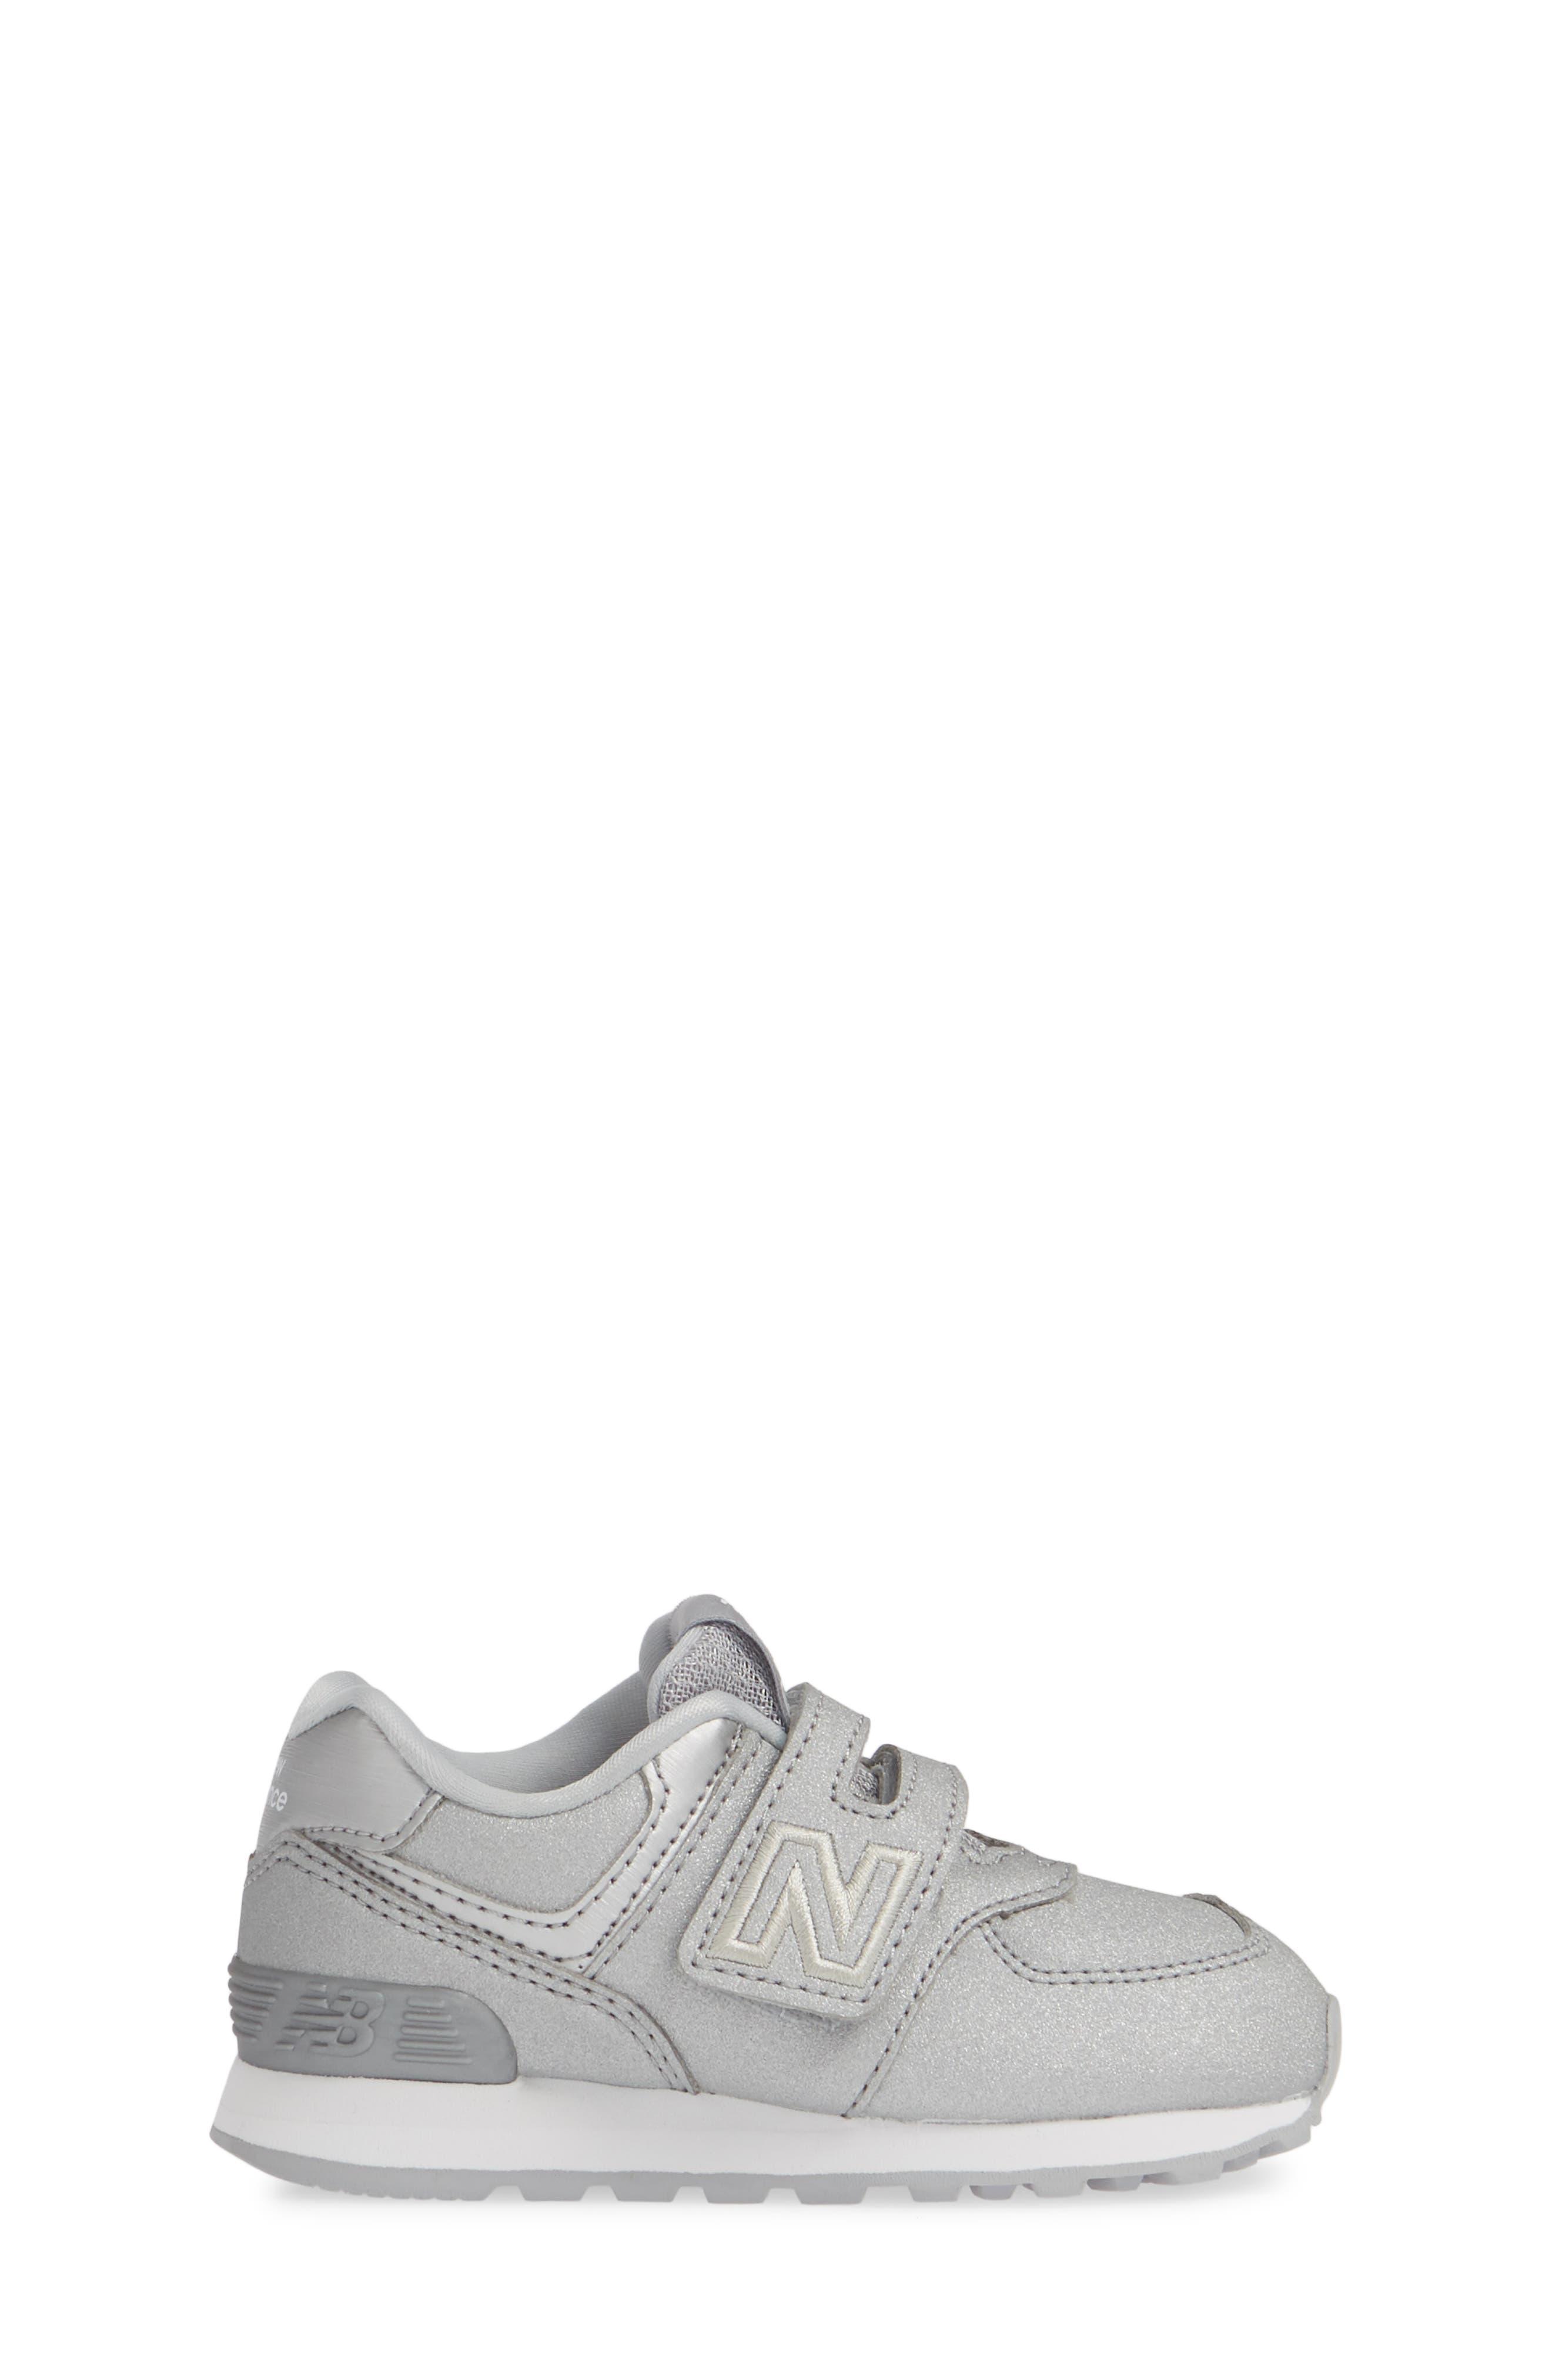 574 Essentials Glitter Sneaker,                             Alternate thumbnail 3, color,                             SILVER